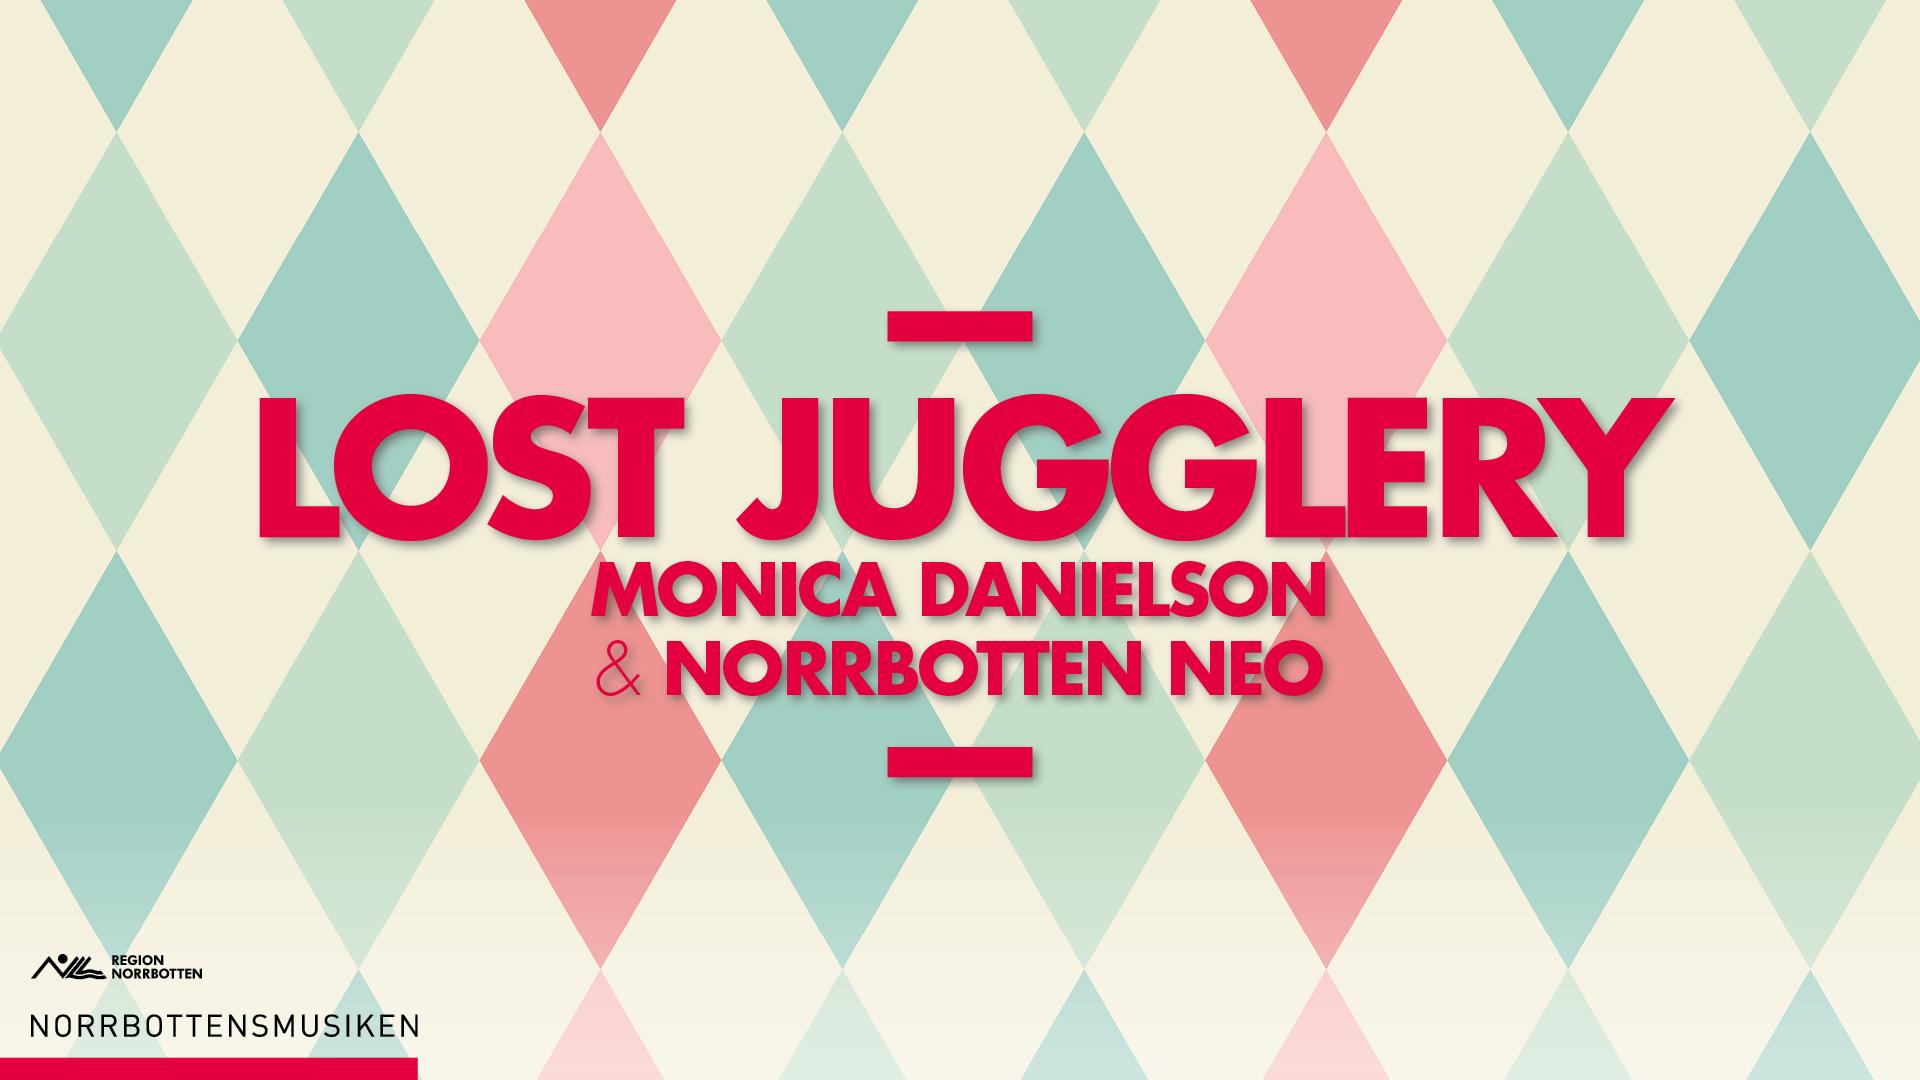 Lost Jugglery